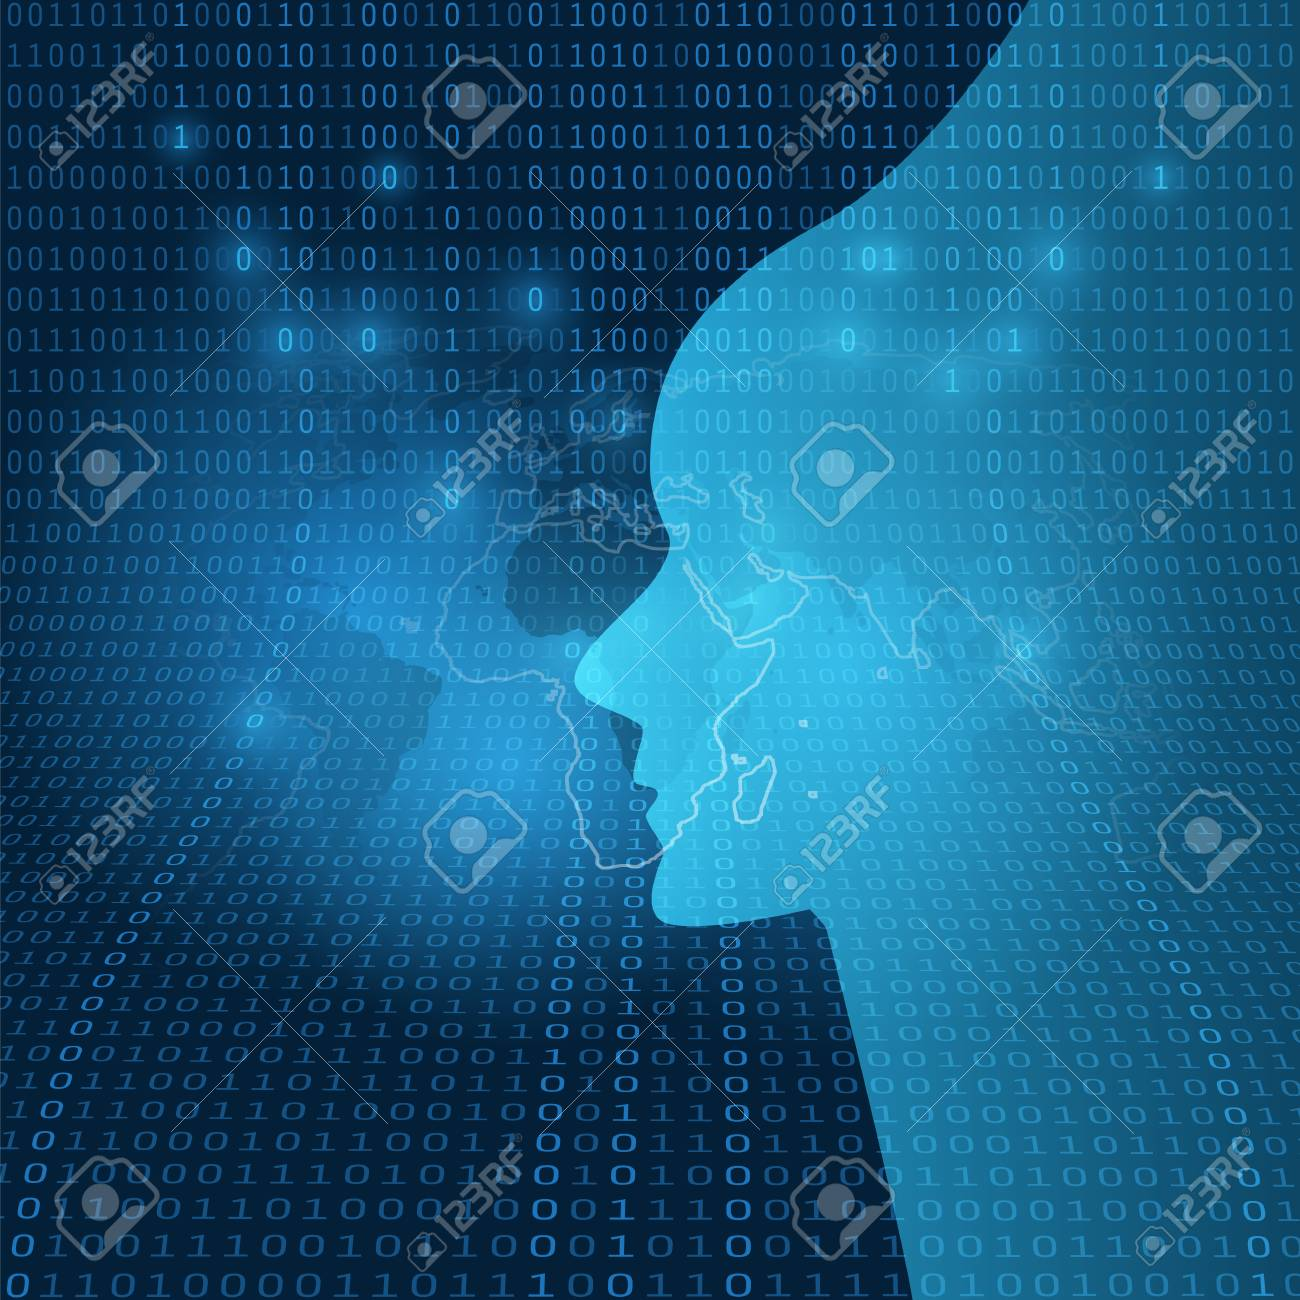 Dark Futuristic Machine Learning Artificial Intelligence Cloud